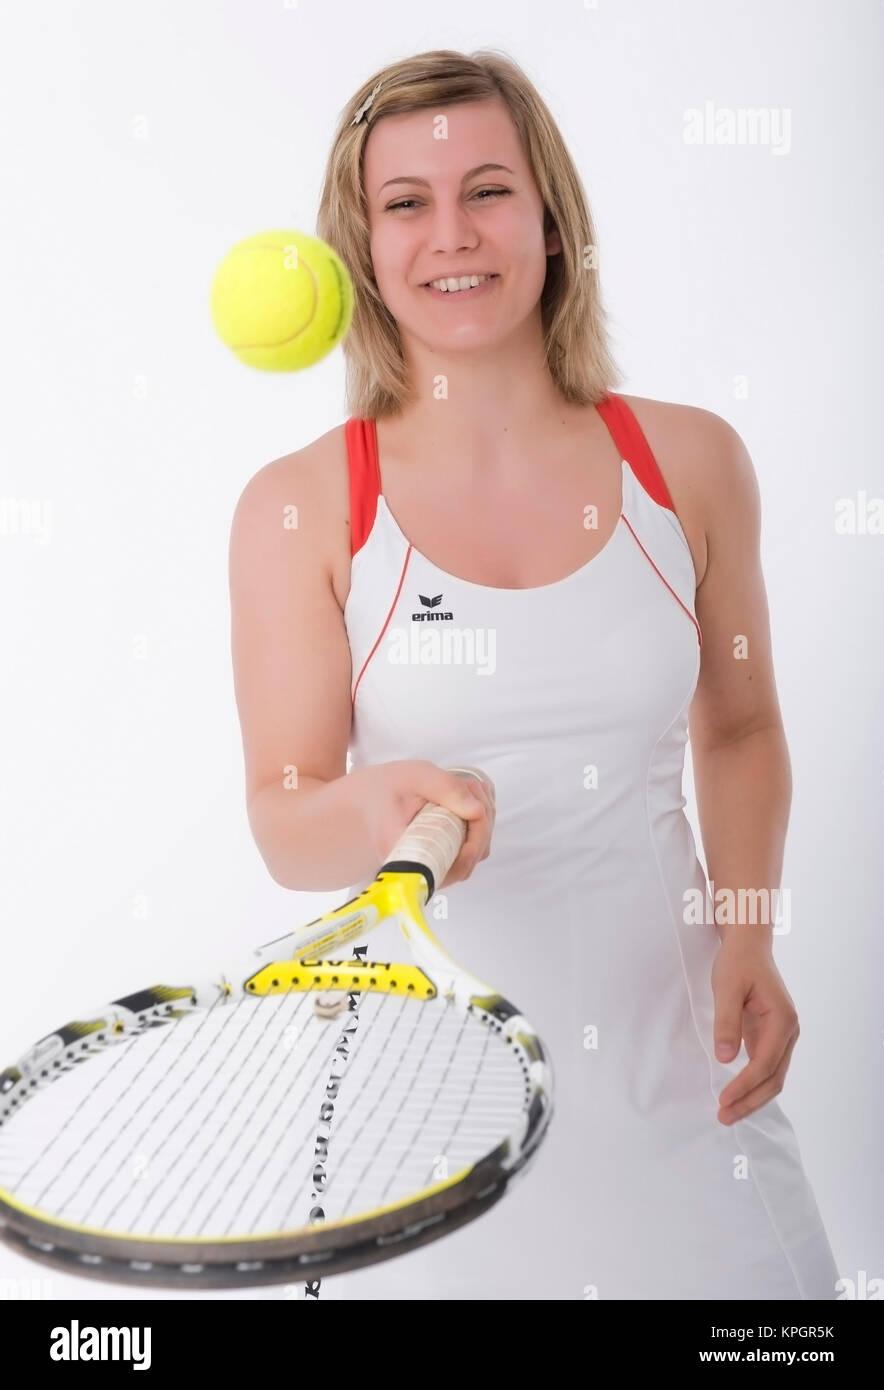 Model Release, Jugendliche Tennisspielerin - junge Tennisspieler Stockbild